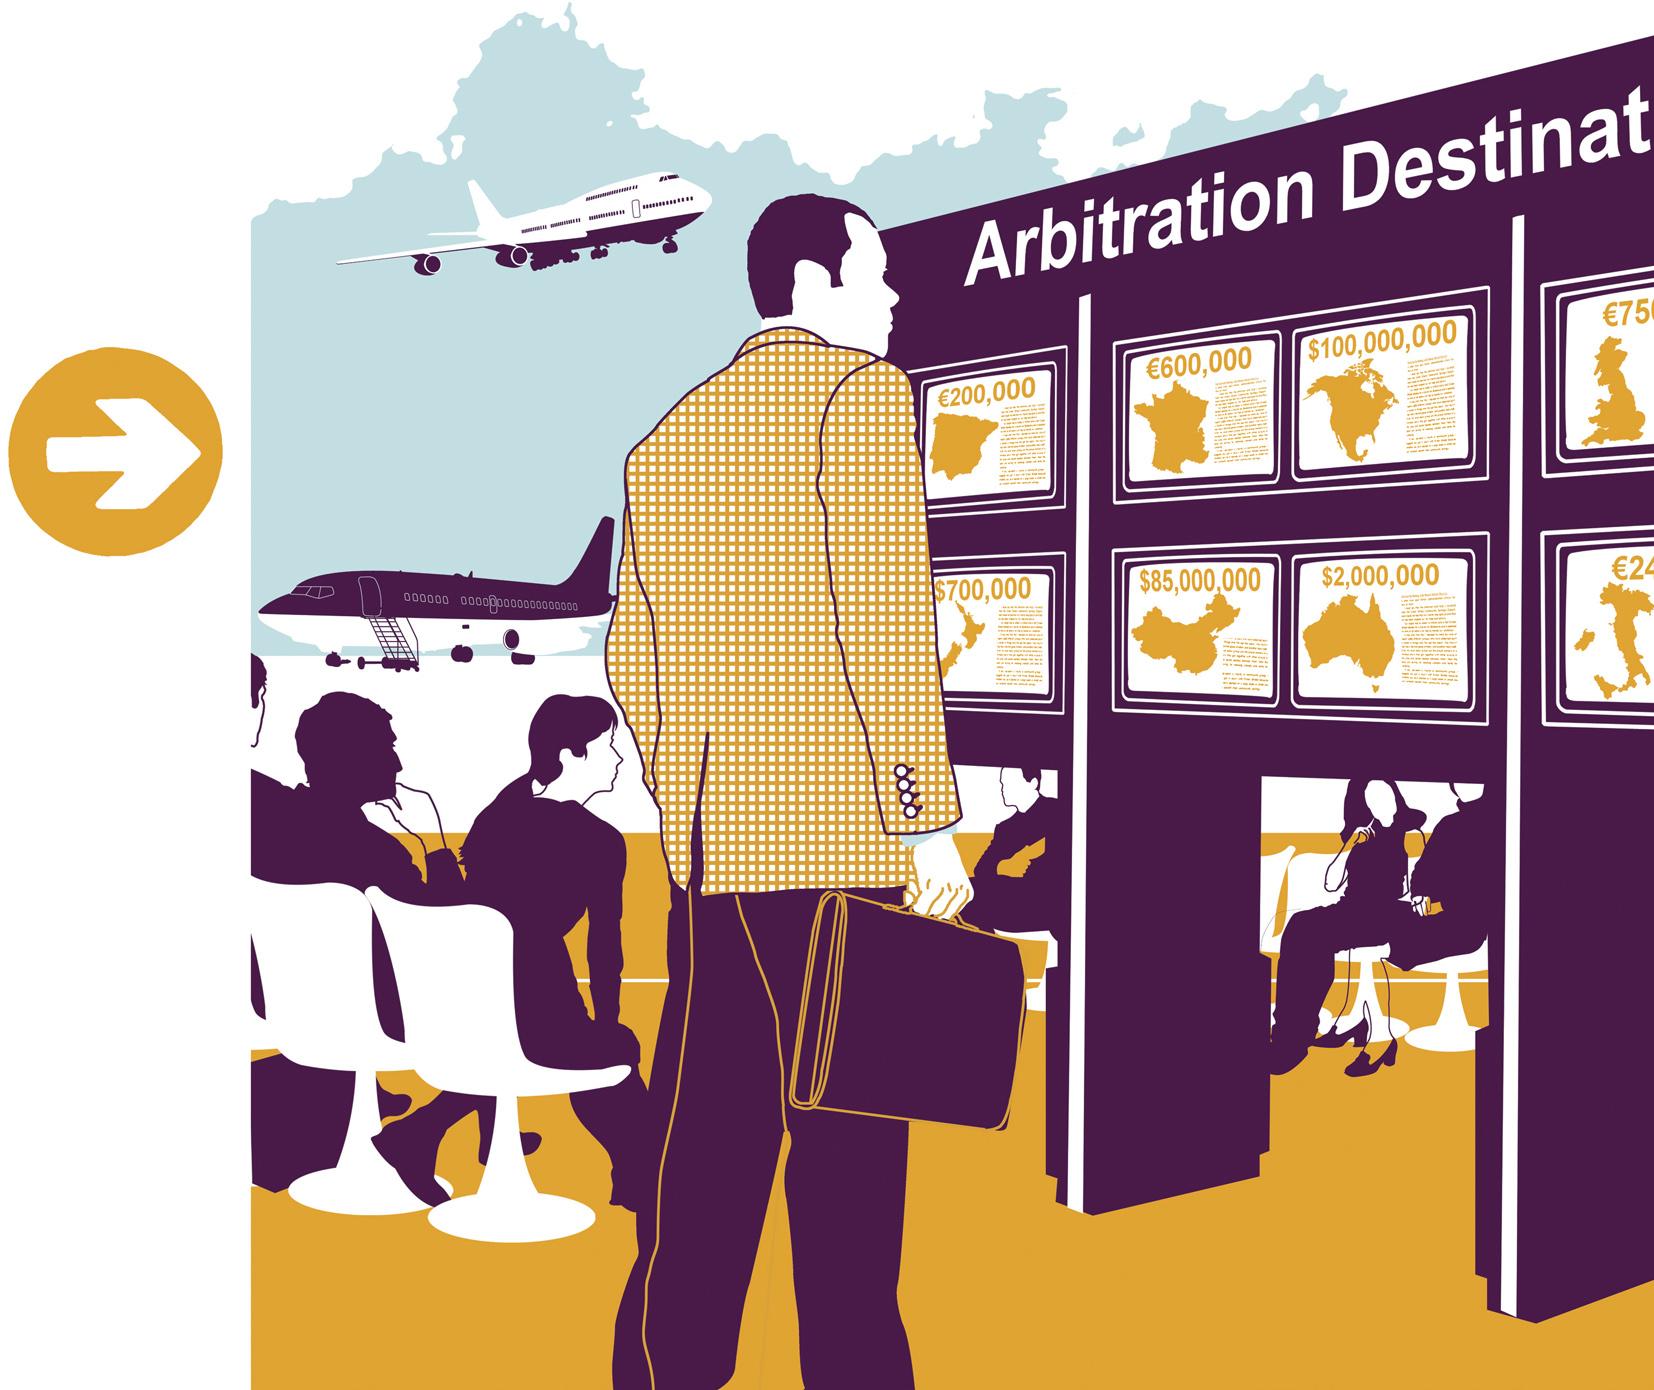 Airport Arbitration